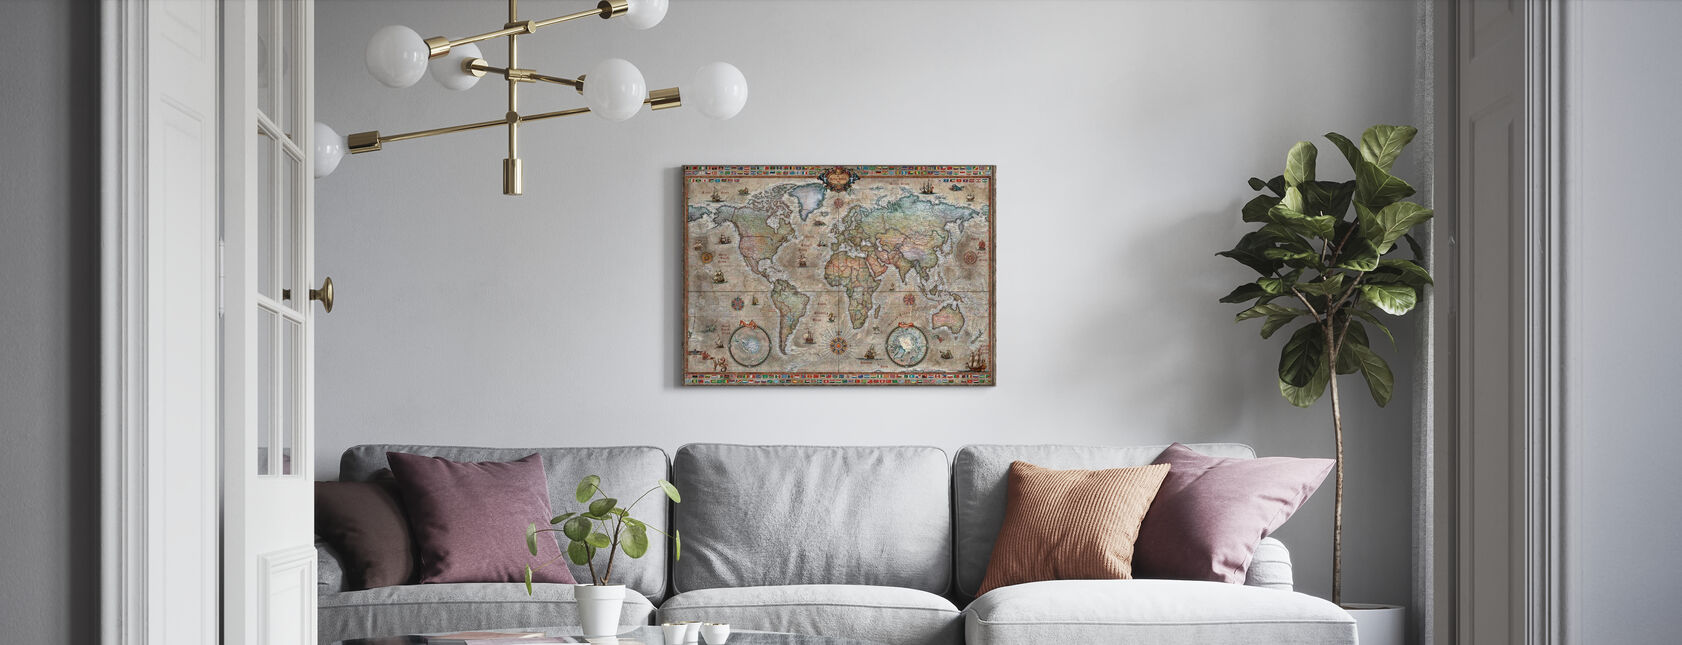 Retro World Map Nordic - Canvas print - Living Room